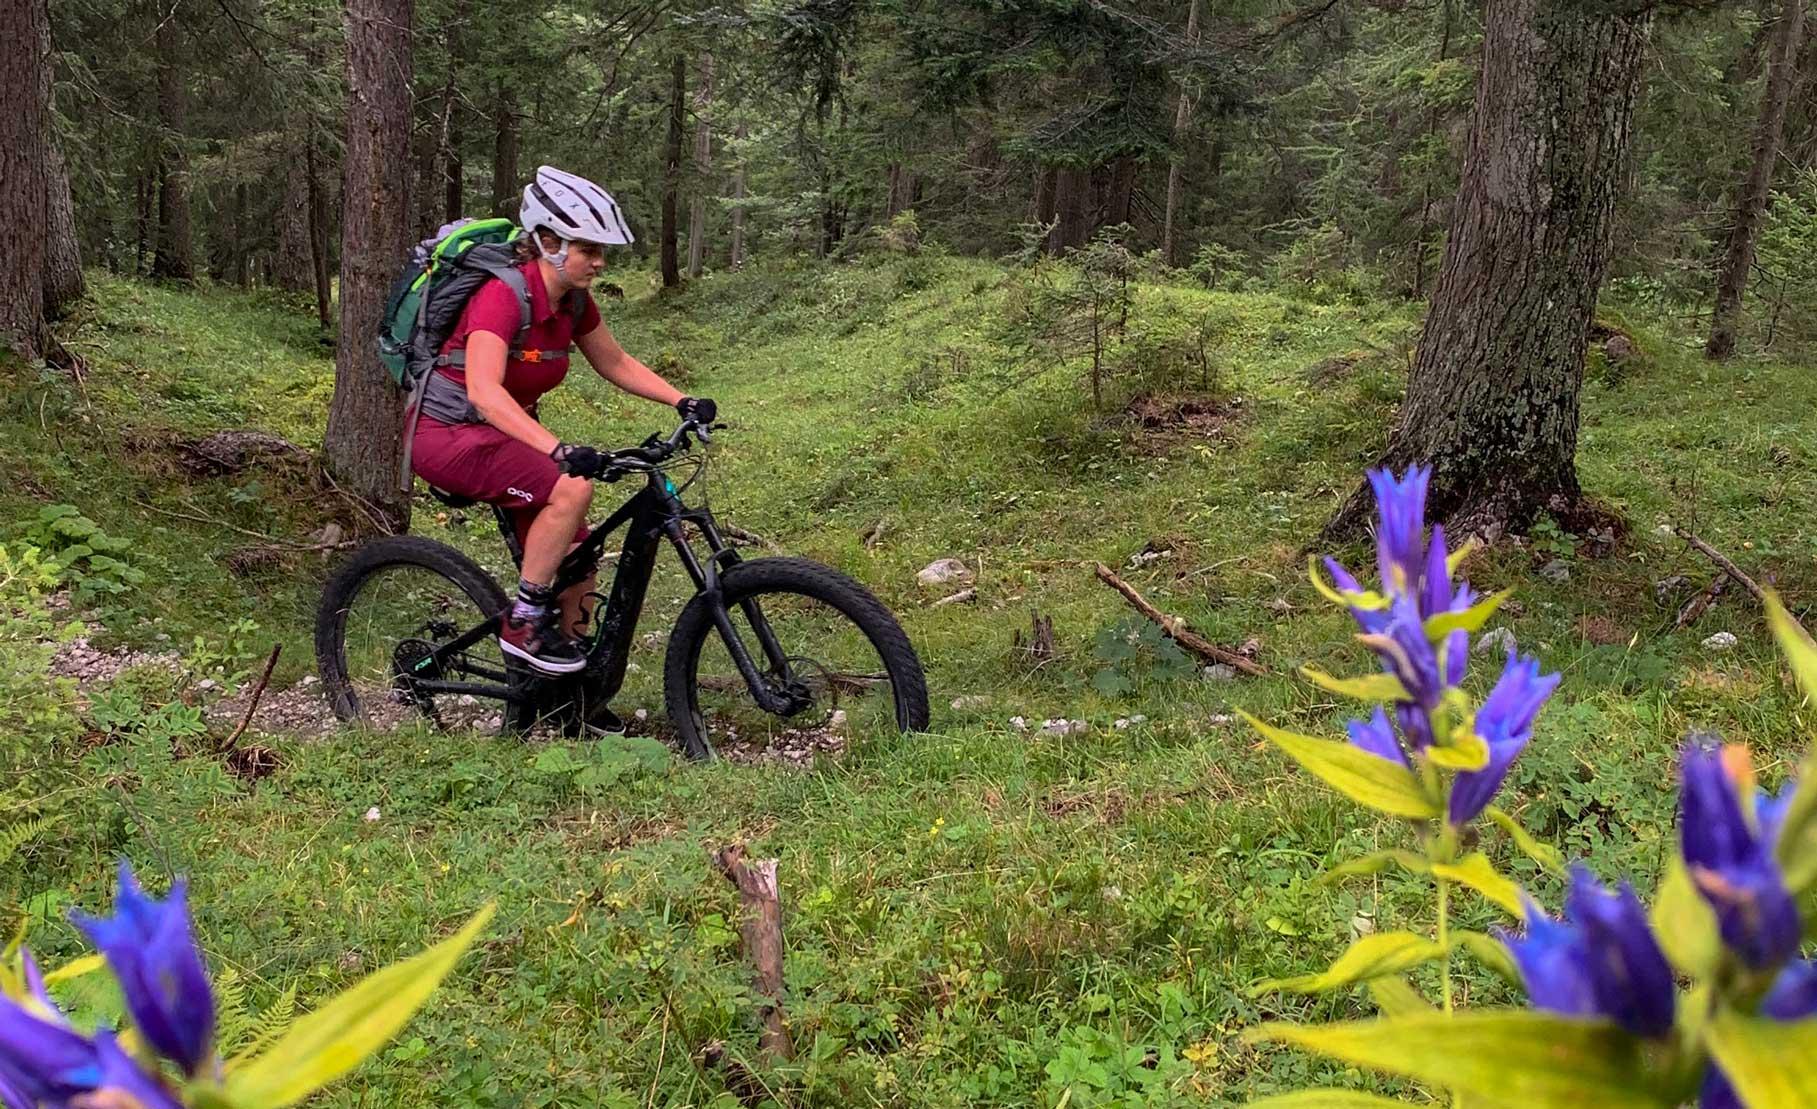 mtb-trails-wald-tiroler-zugspitz-arena